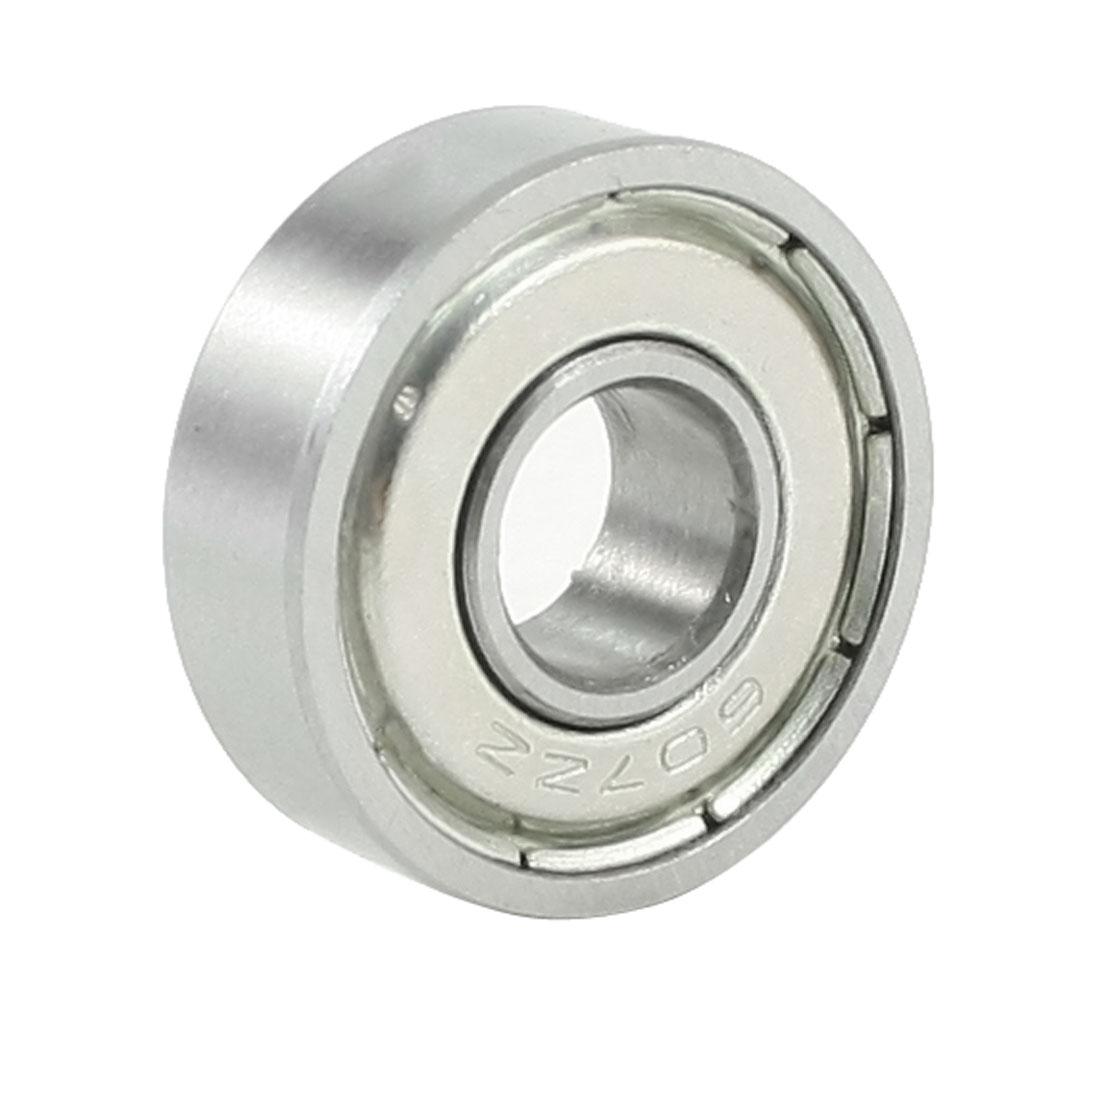 7mmx19mmx6mm Double Shielded 607ZZ Deep Groove Ball Bearing